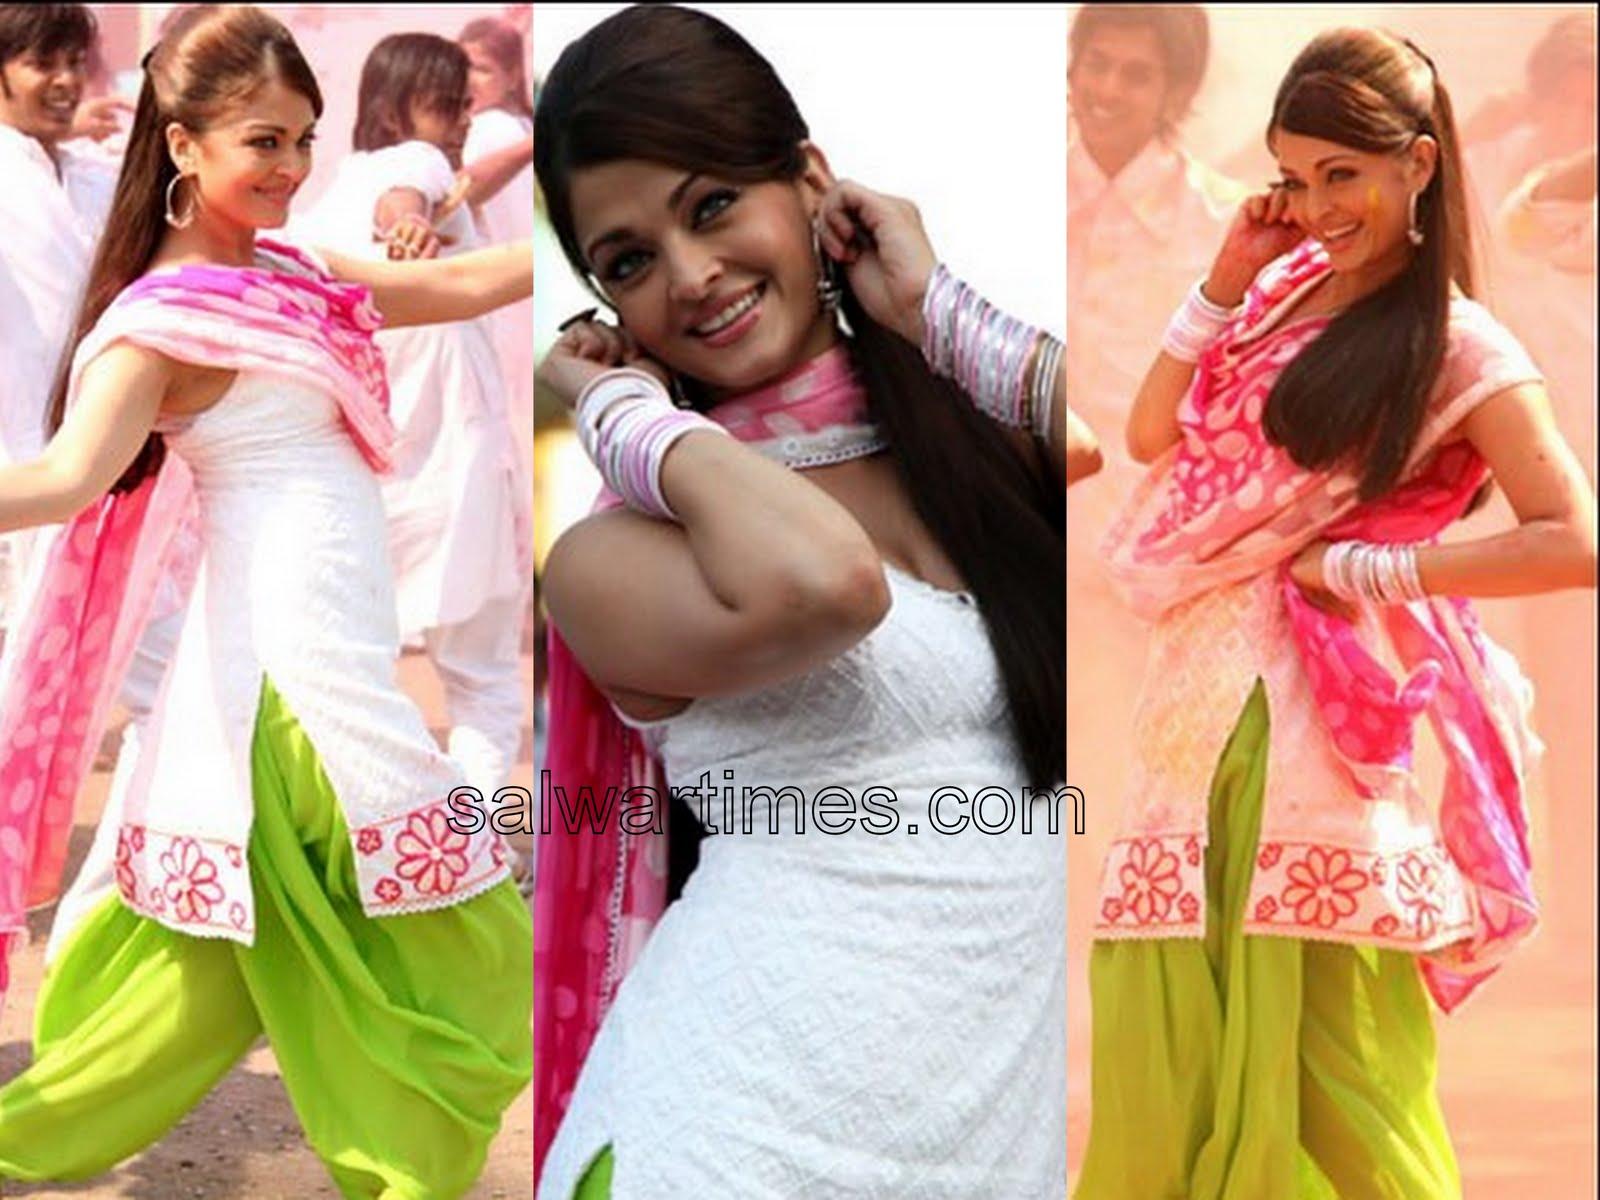 http://2.bp.blogspot.com/_jJHM9-HXtXI/TSd54ks0iqI/AAAAAAAAASw/1X6miU4Iy4g/s1600/Aishwarya-Rai-Cotton-Salwar.jpg